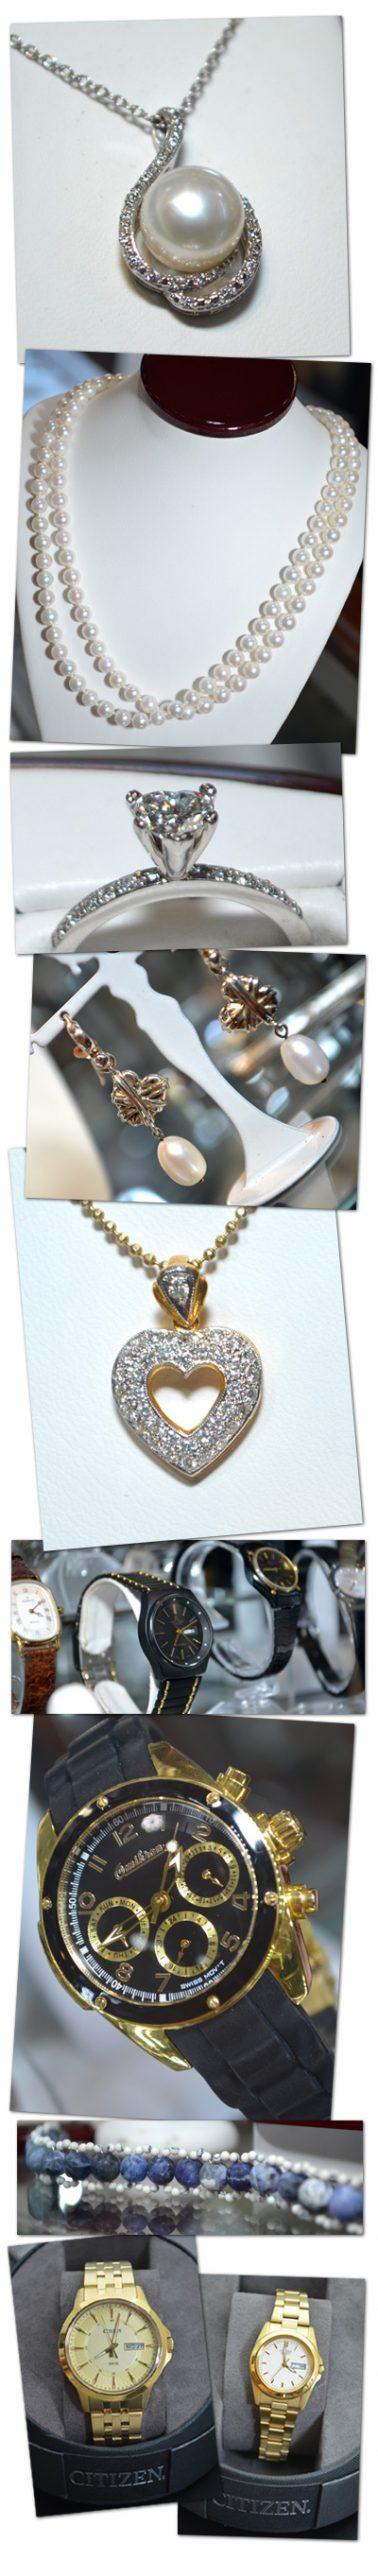 Oro Jewelers in Boulder City, Nevada Contest